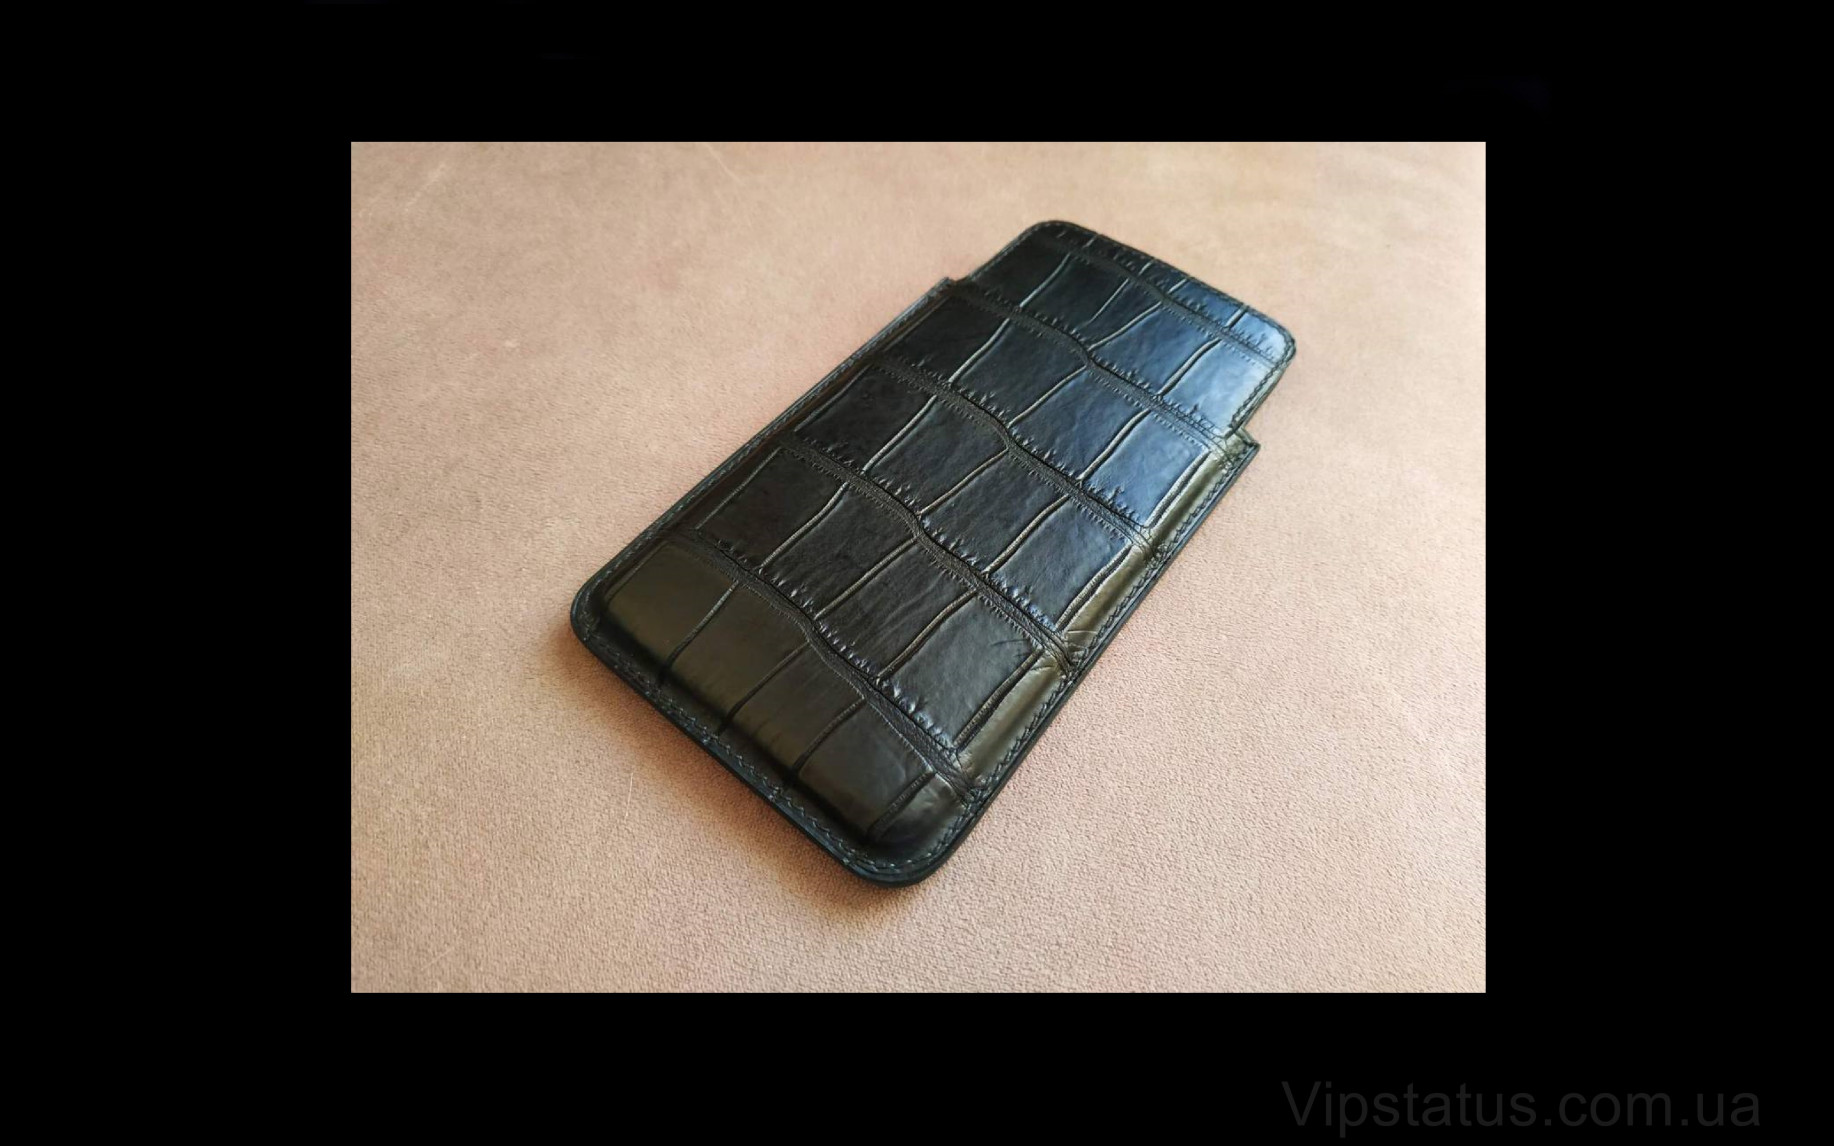 Elite Black Prince Вип кейс IPhone 11 12 Pro Max кожа крокодила Black Prince Vip case IPhone 11 12 Pro Max Crocodile leather image 2